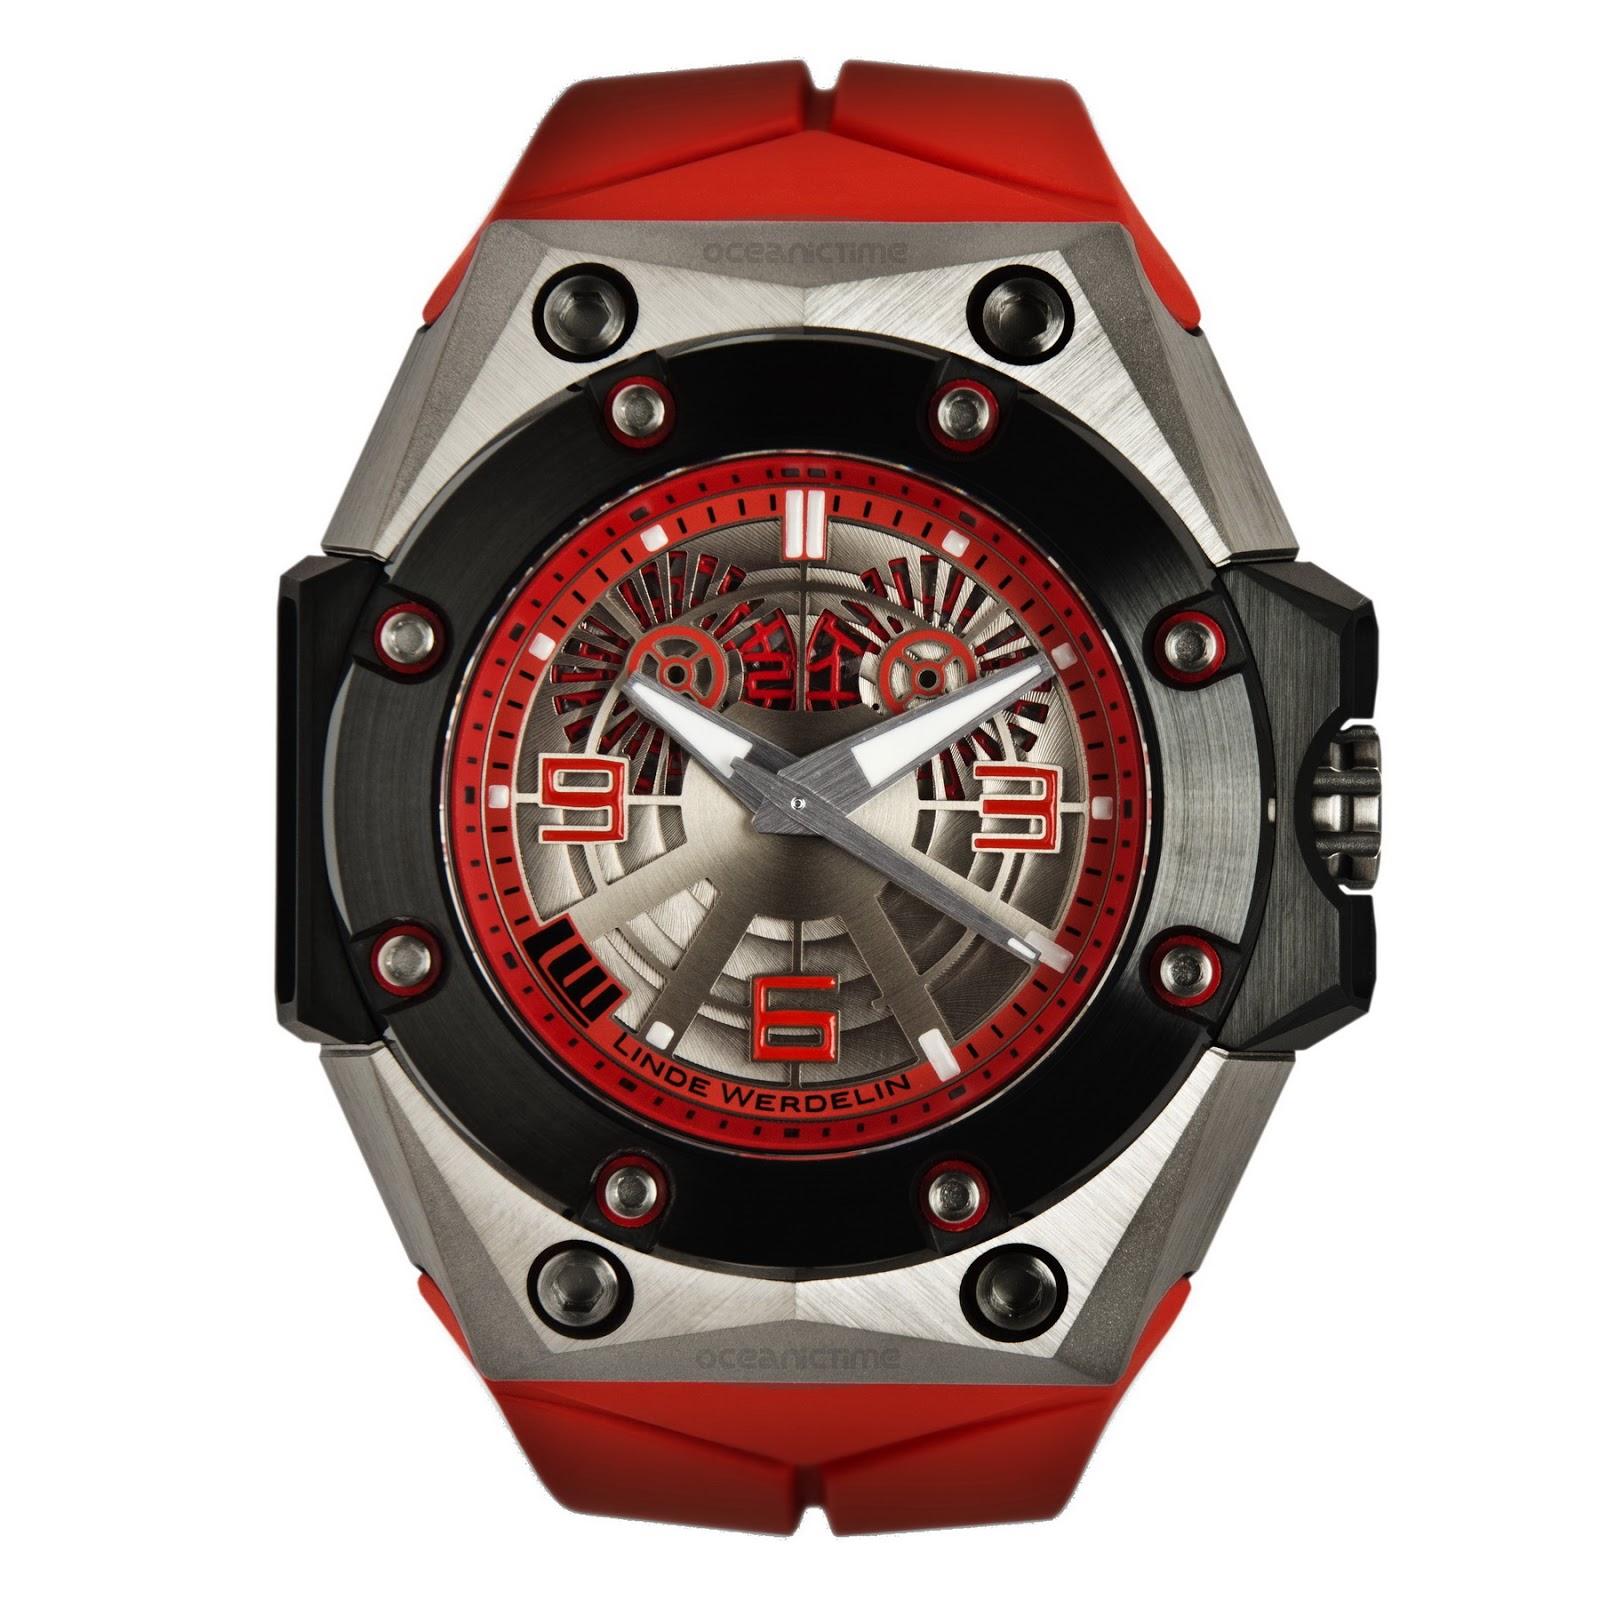 Linde Werdelin Oktopus II Titanium Red